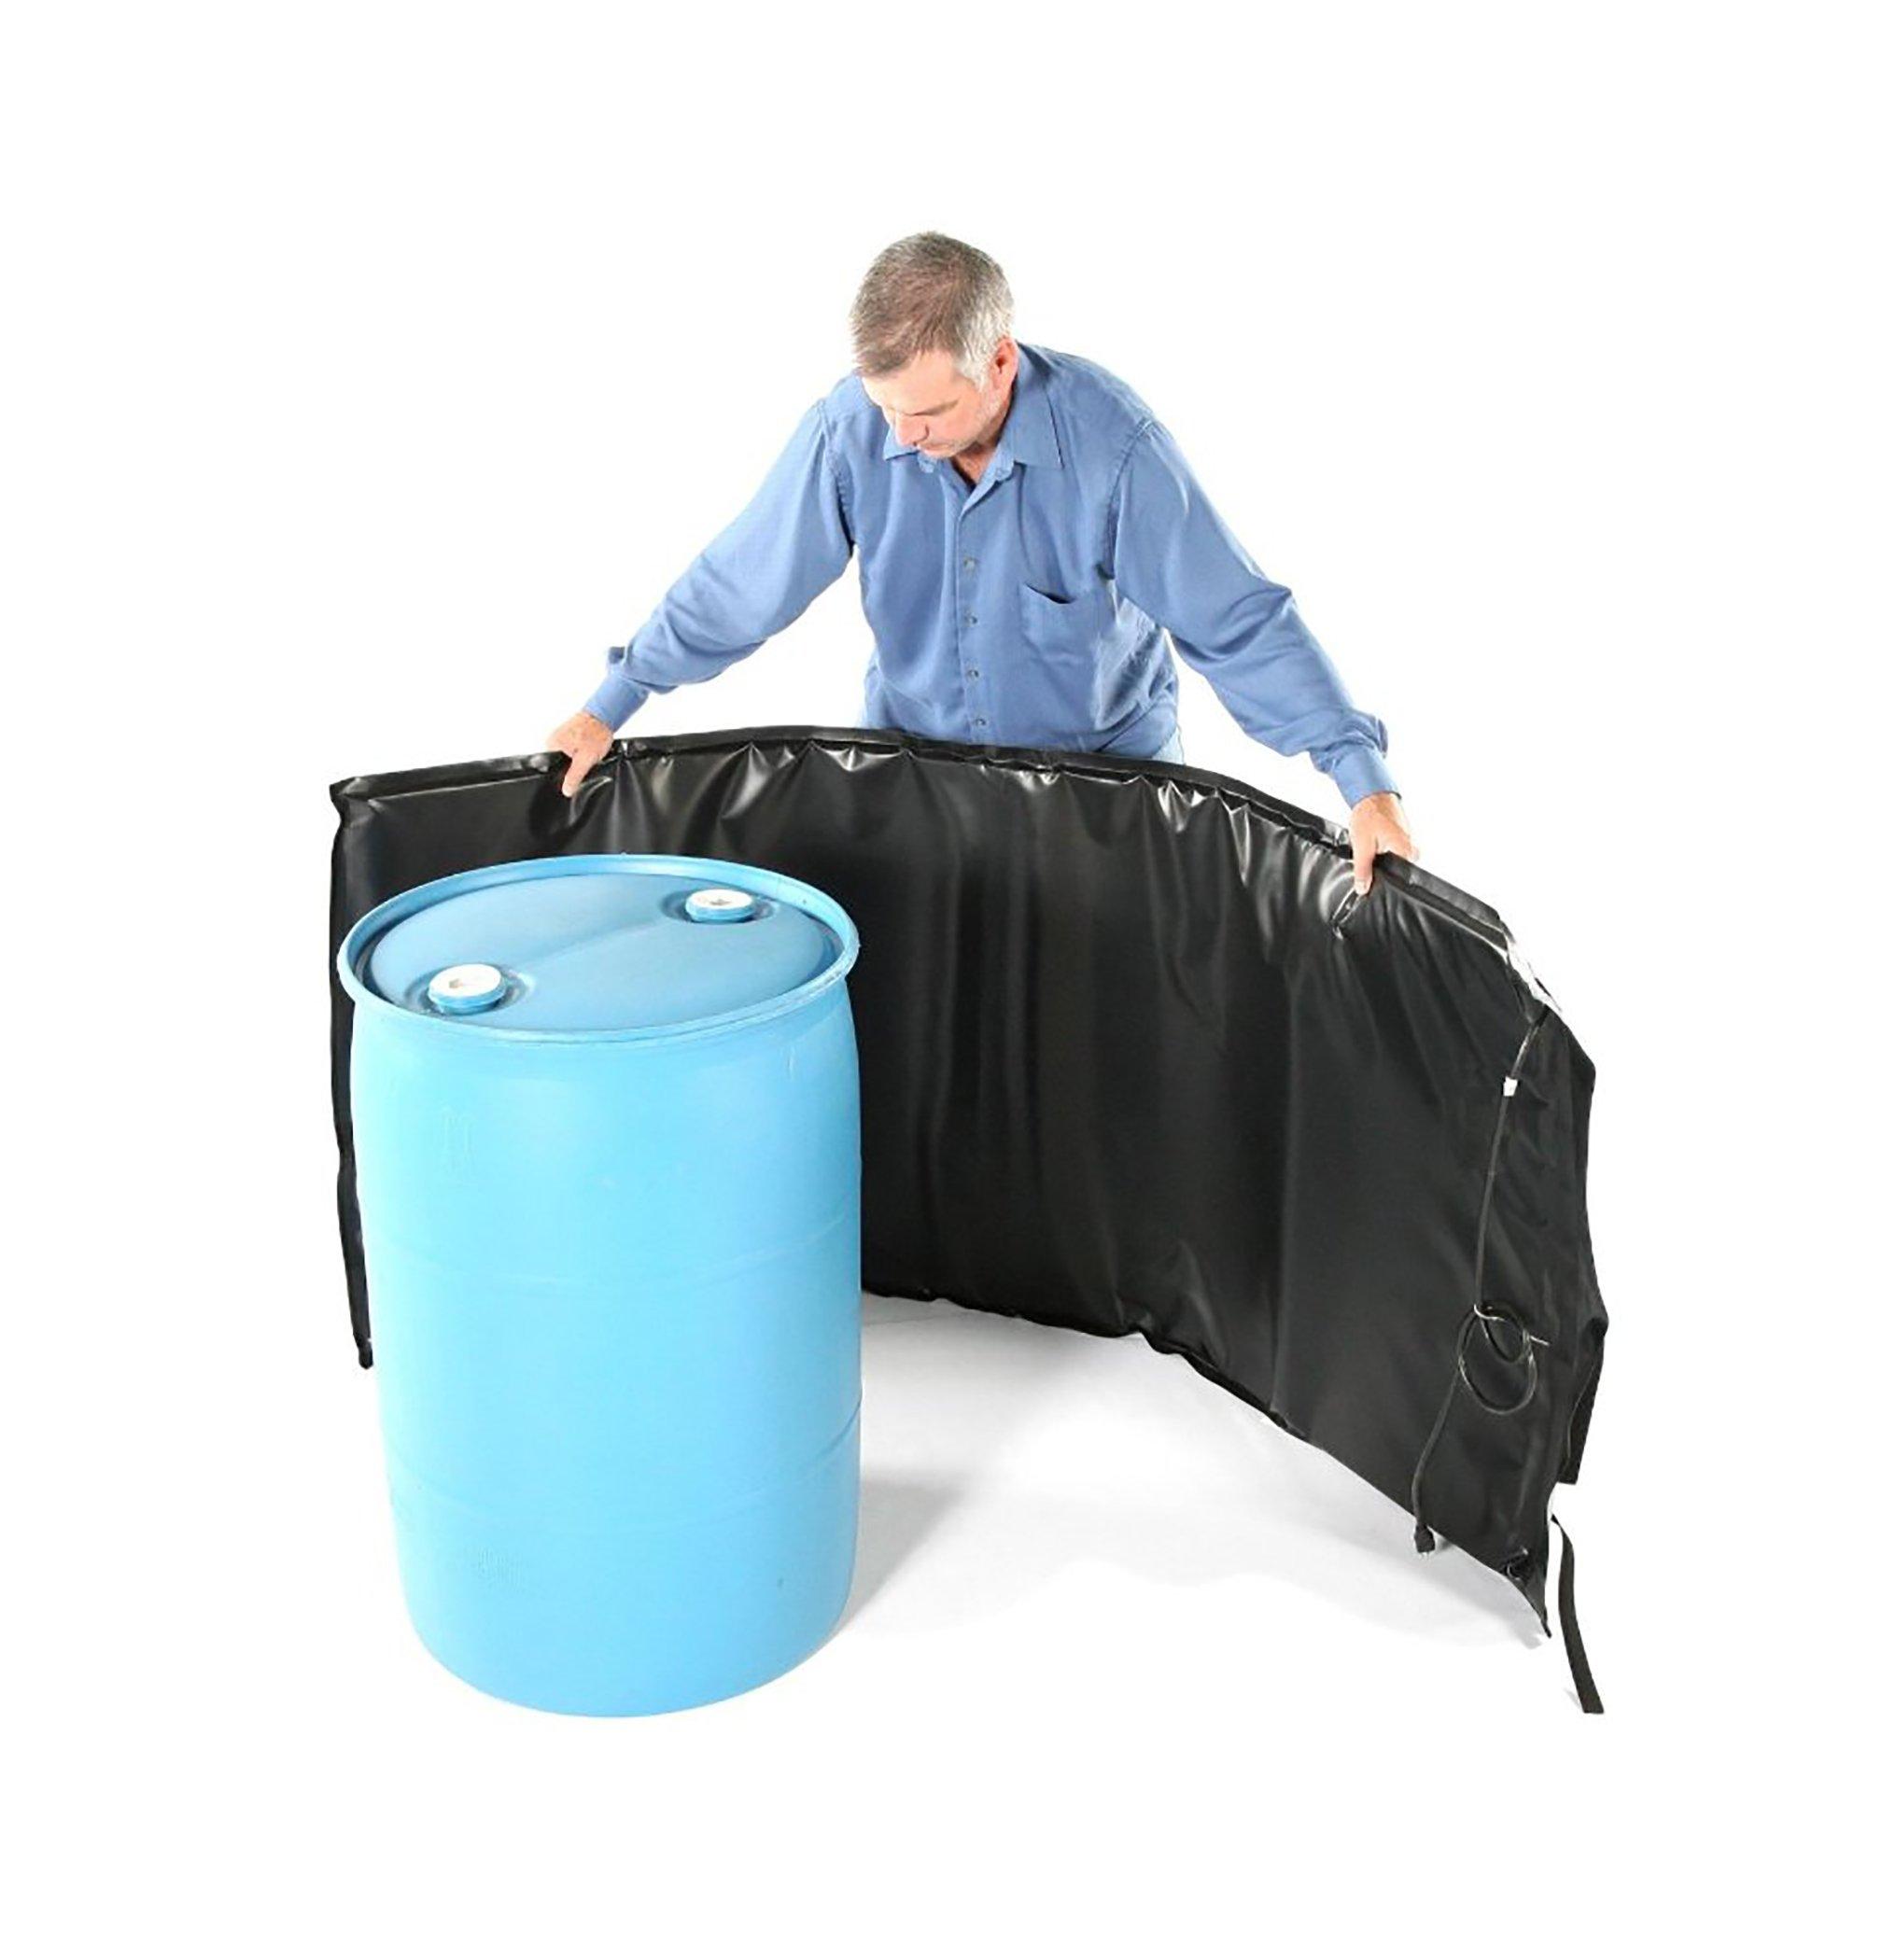 Powerblanket BH55PRO-240V Industrial Grade/Weather Resistant D-15 Vinyl Shell 55 gal Drum Heating Blanket with Adjustable Thermostat Controller, 240V, Black